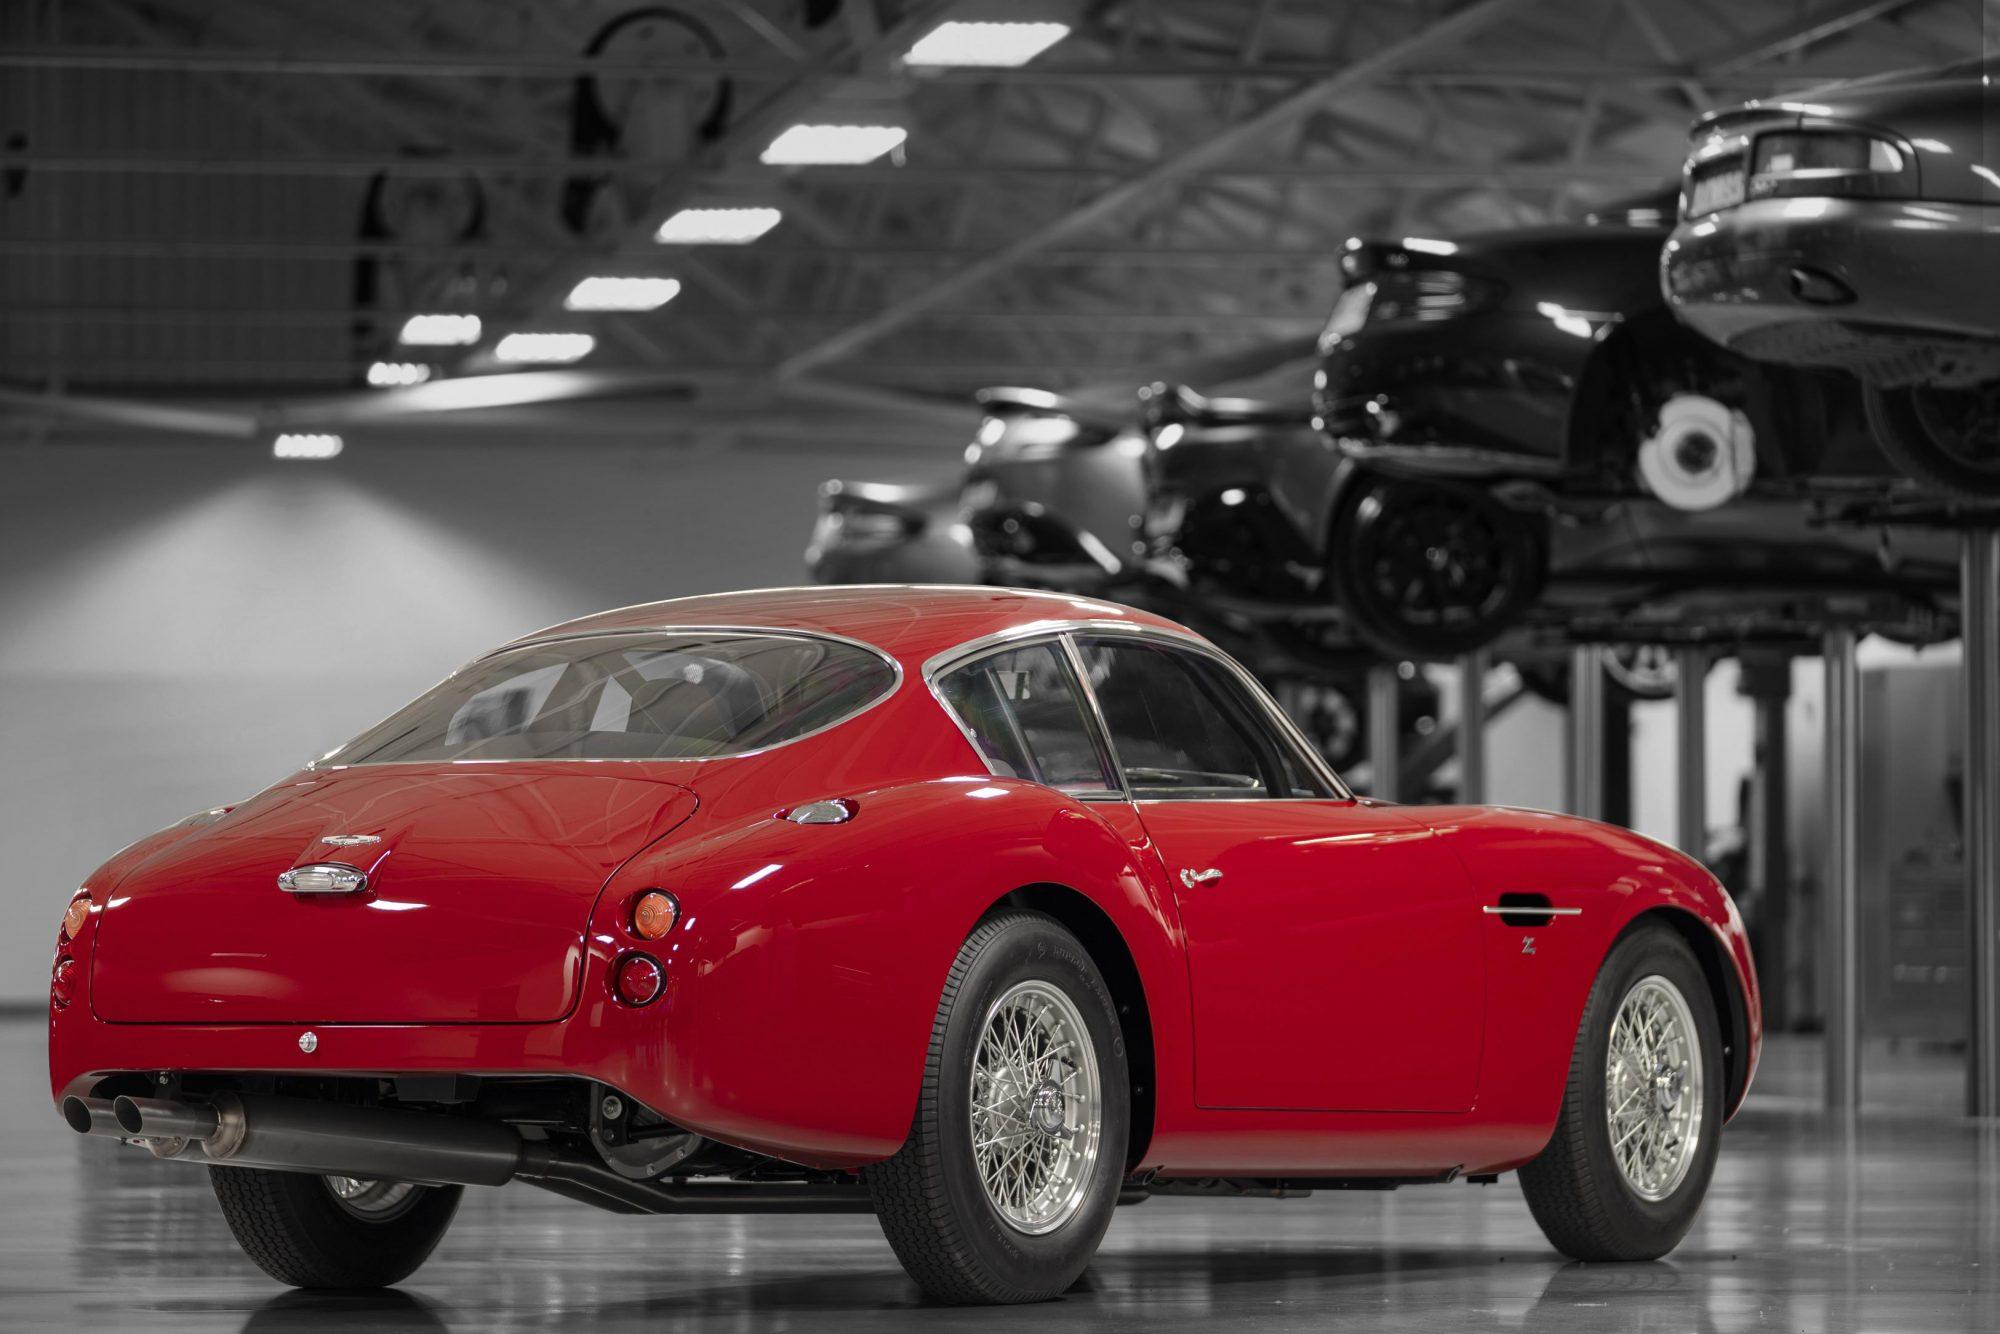 Aston Martin, Aston martin DB4 Zagato, DB4, Zagato, Zagato Continuation, DB4 rear